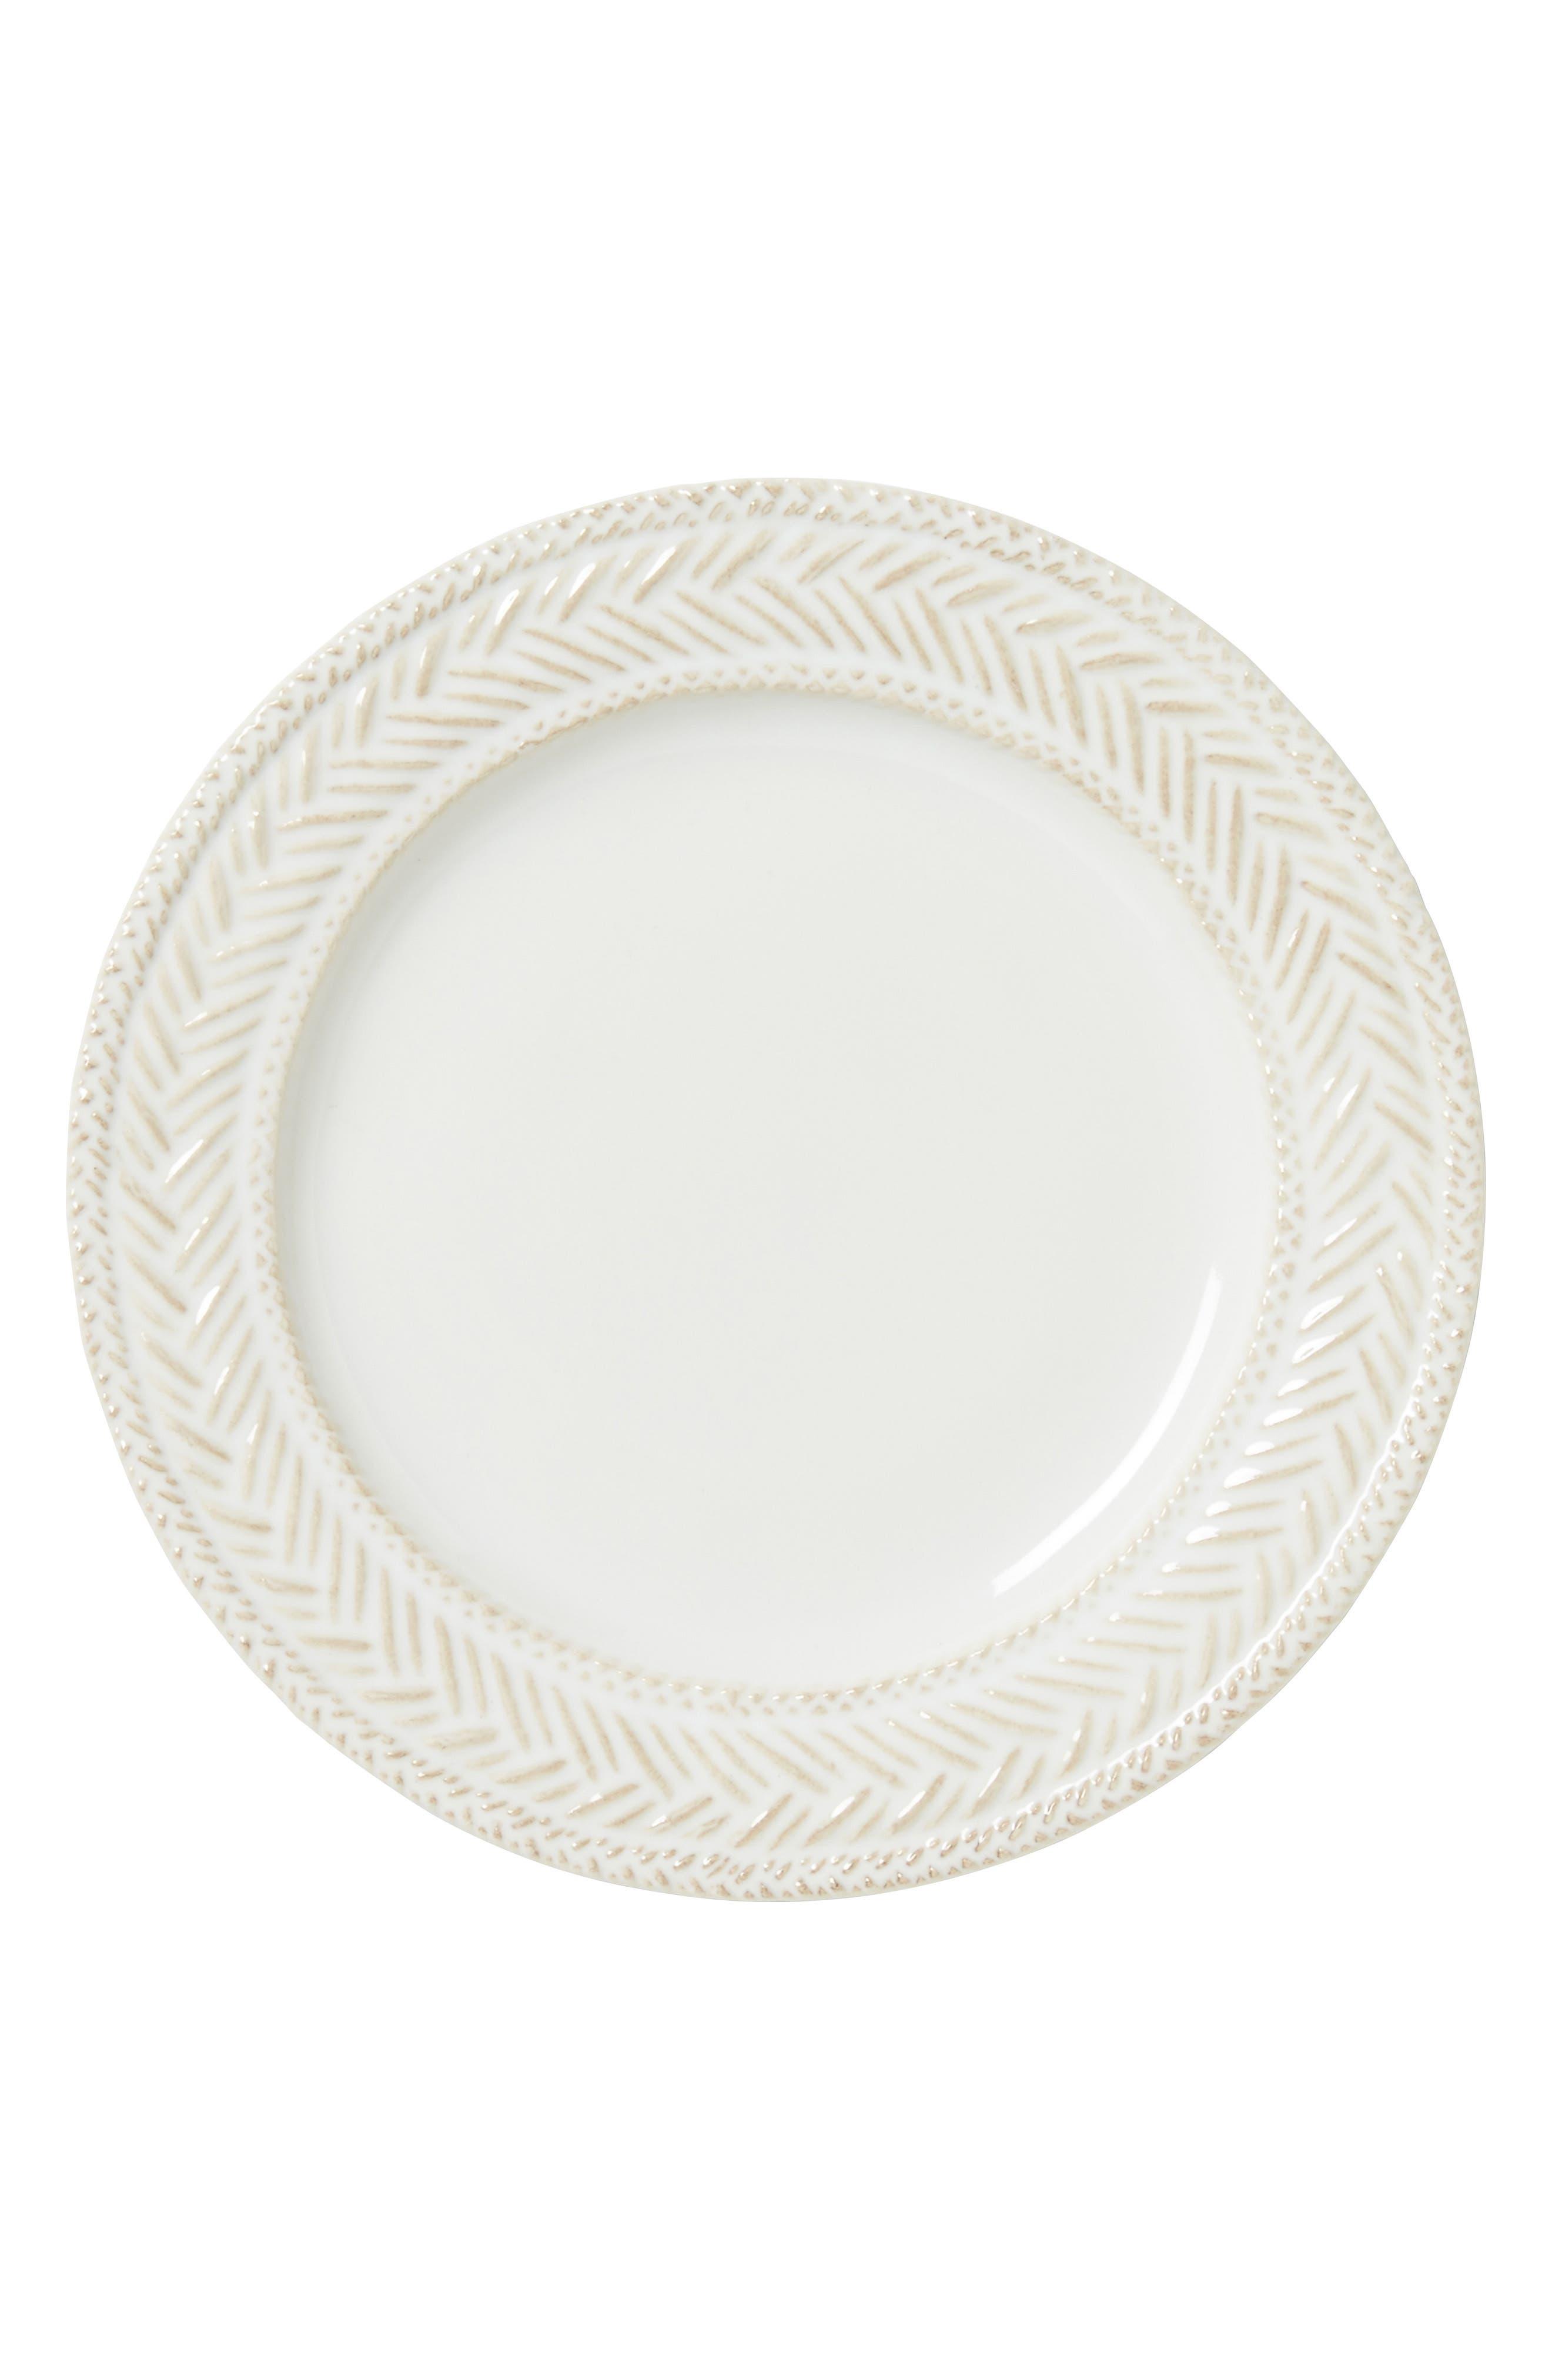 Le Panier Whitewash Side Plate,                             Main thumbnail 1, color,                             WHITEWASH